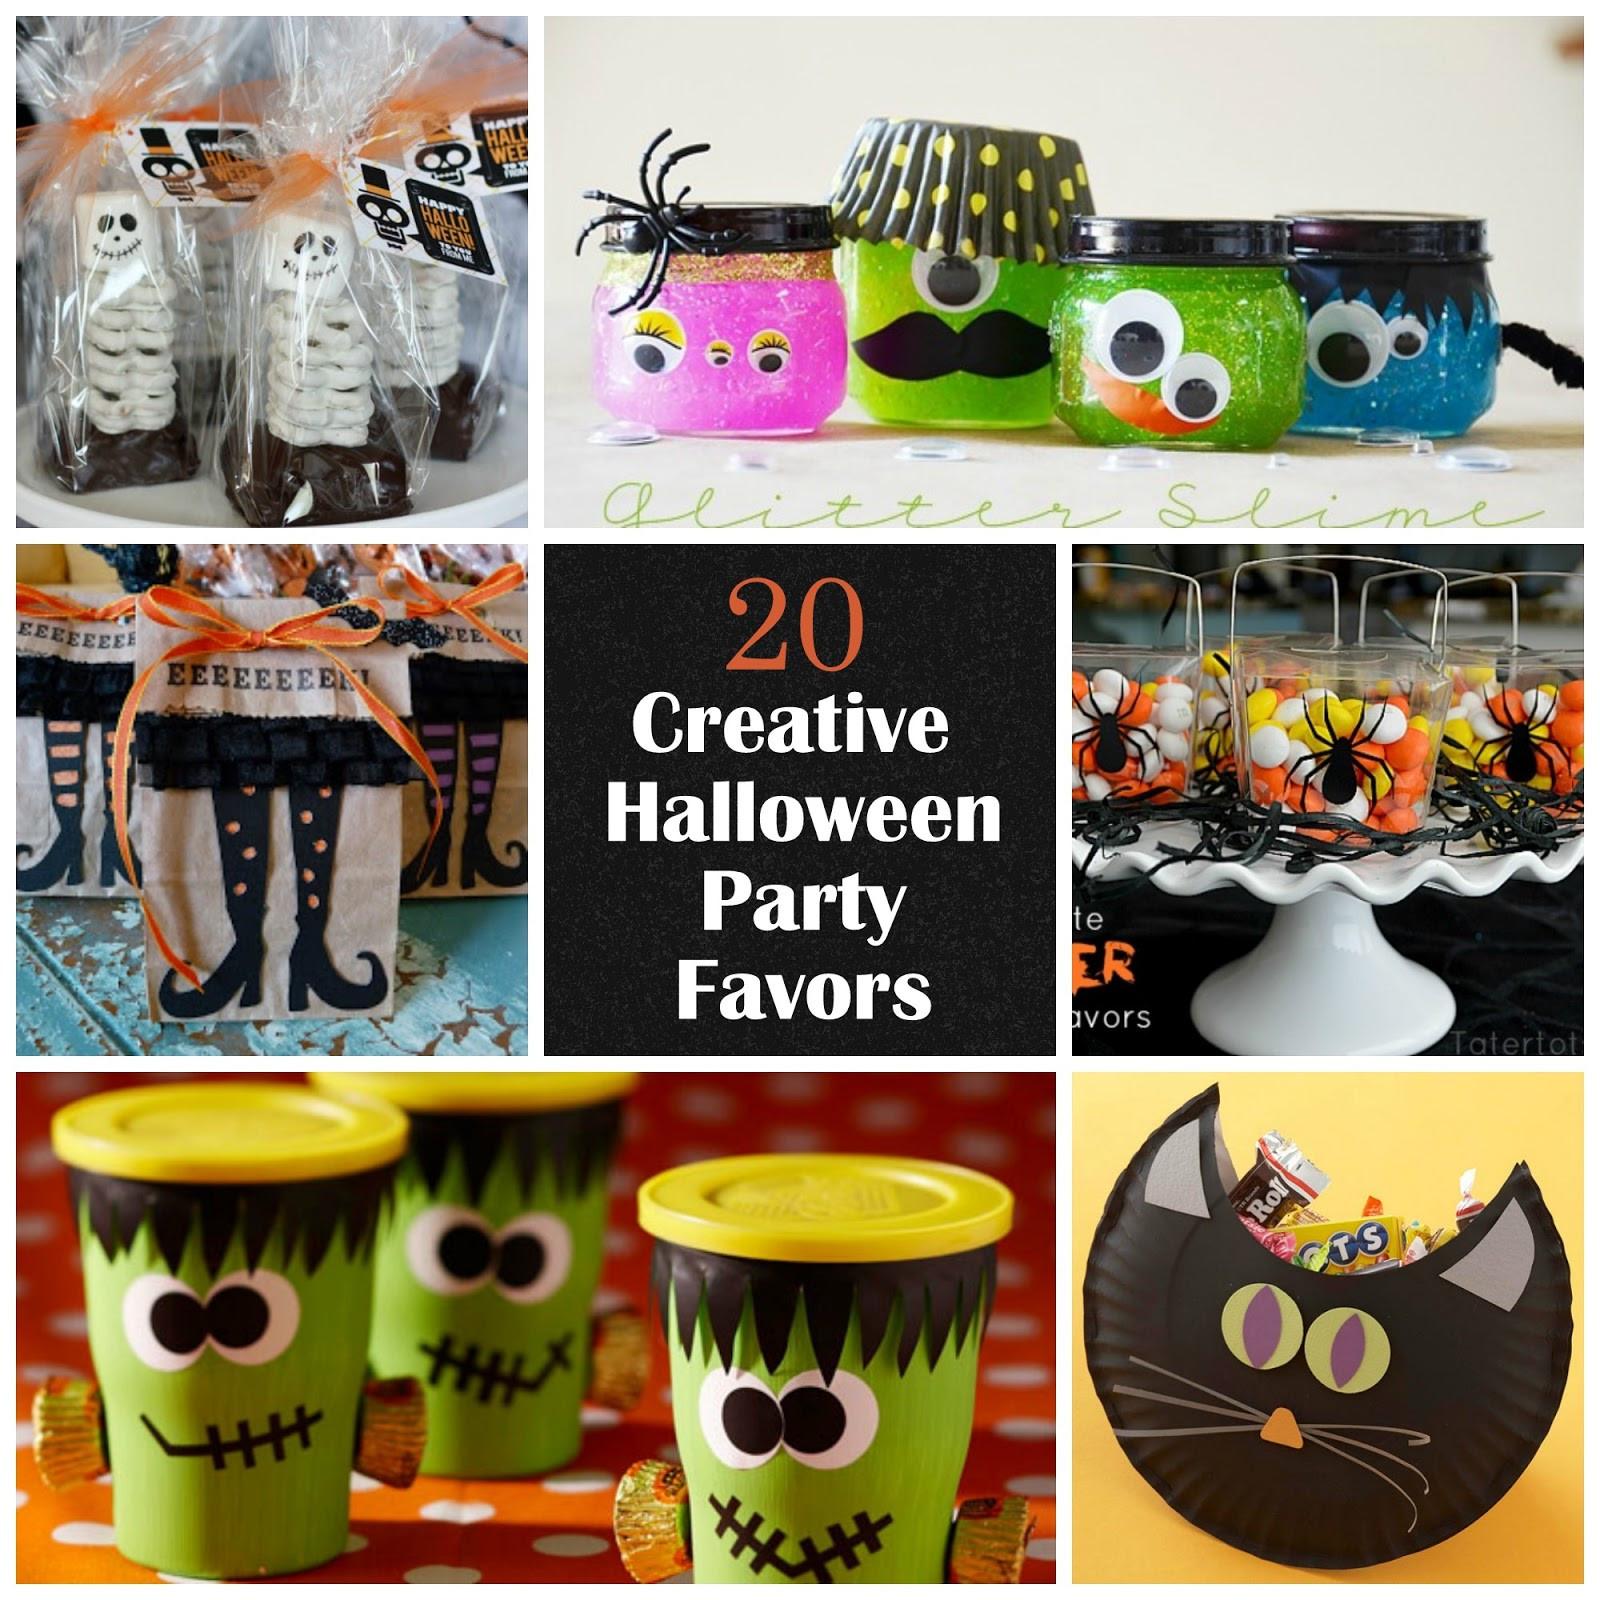 Creative Halloween Party Ideas  20 Creative Halloween Party Favors I Dig Pinterest